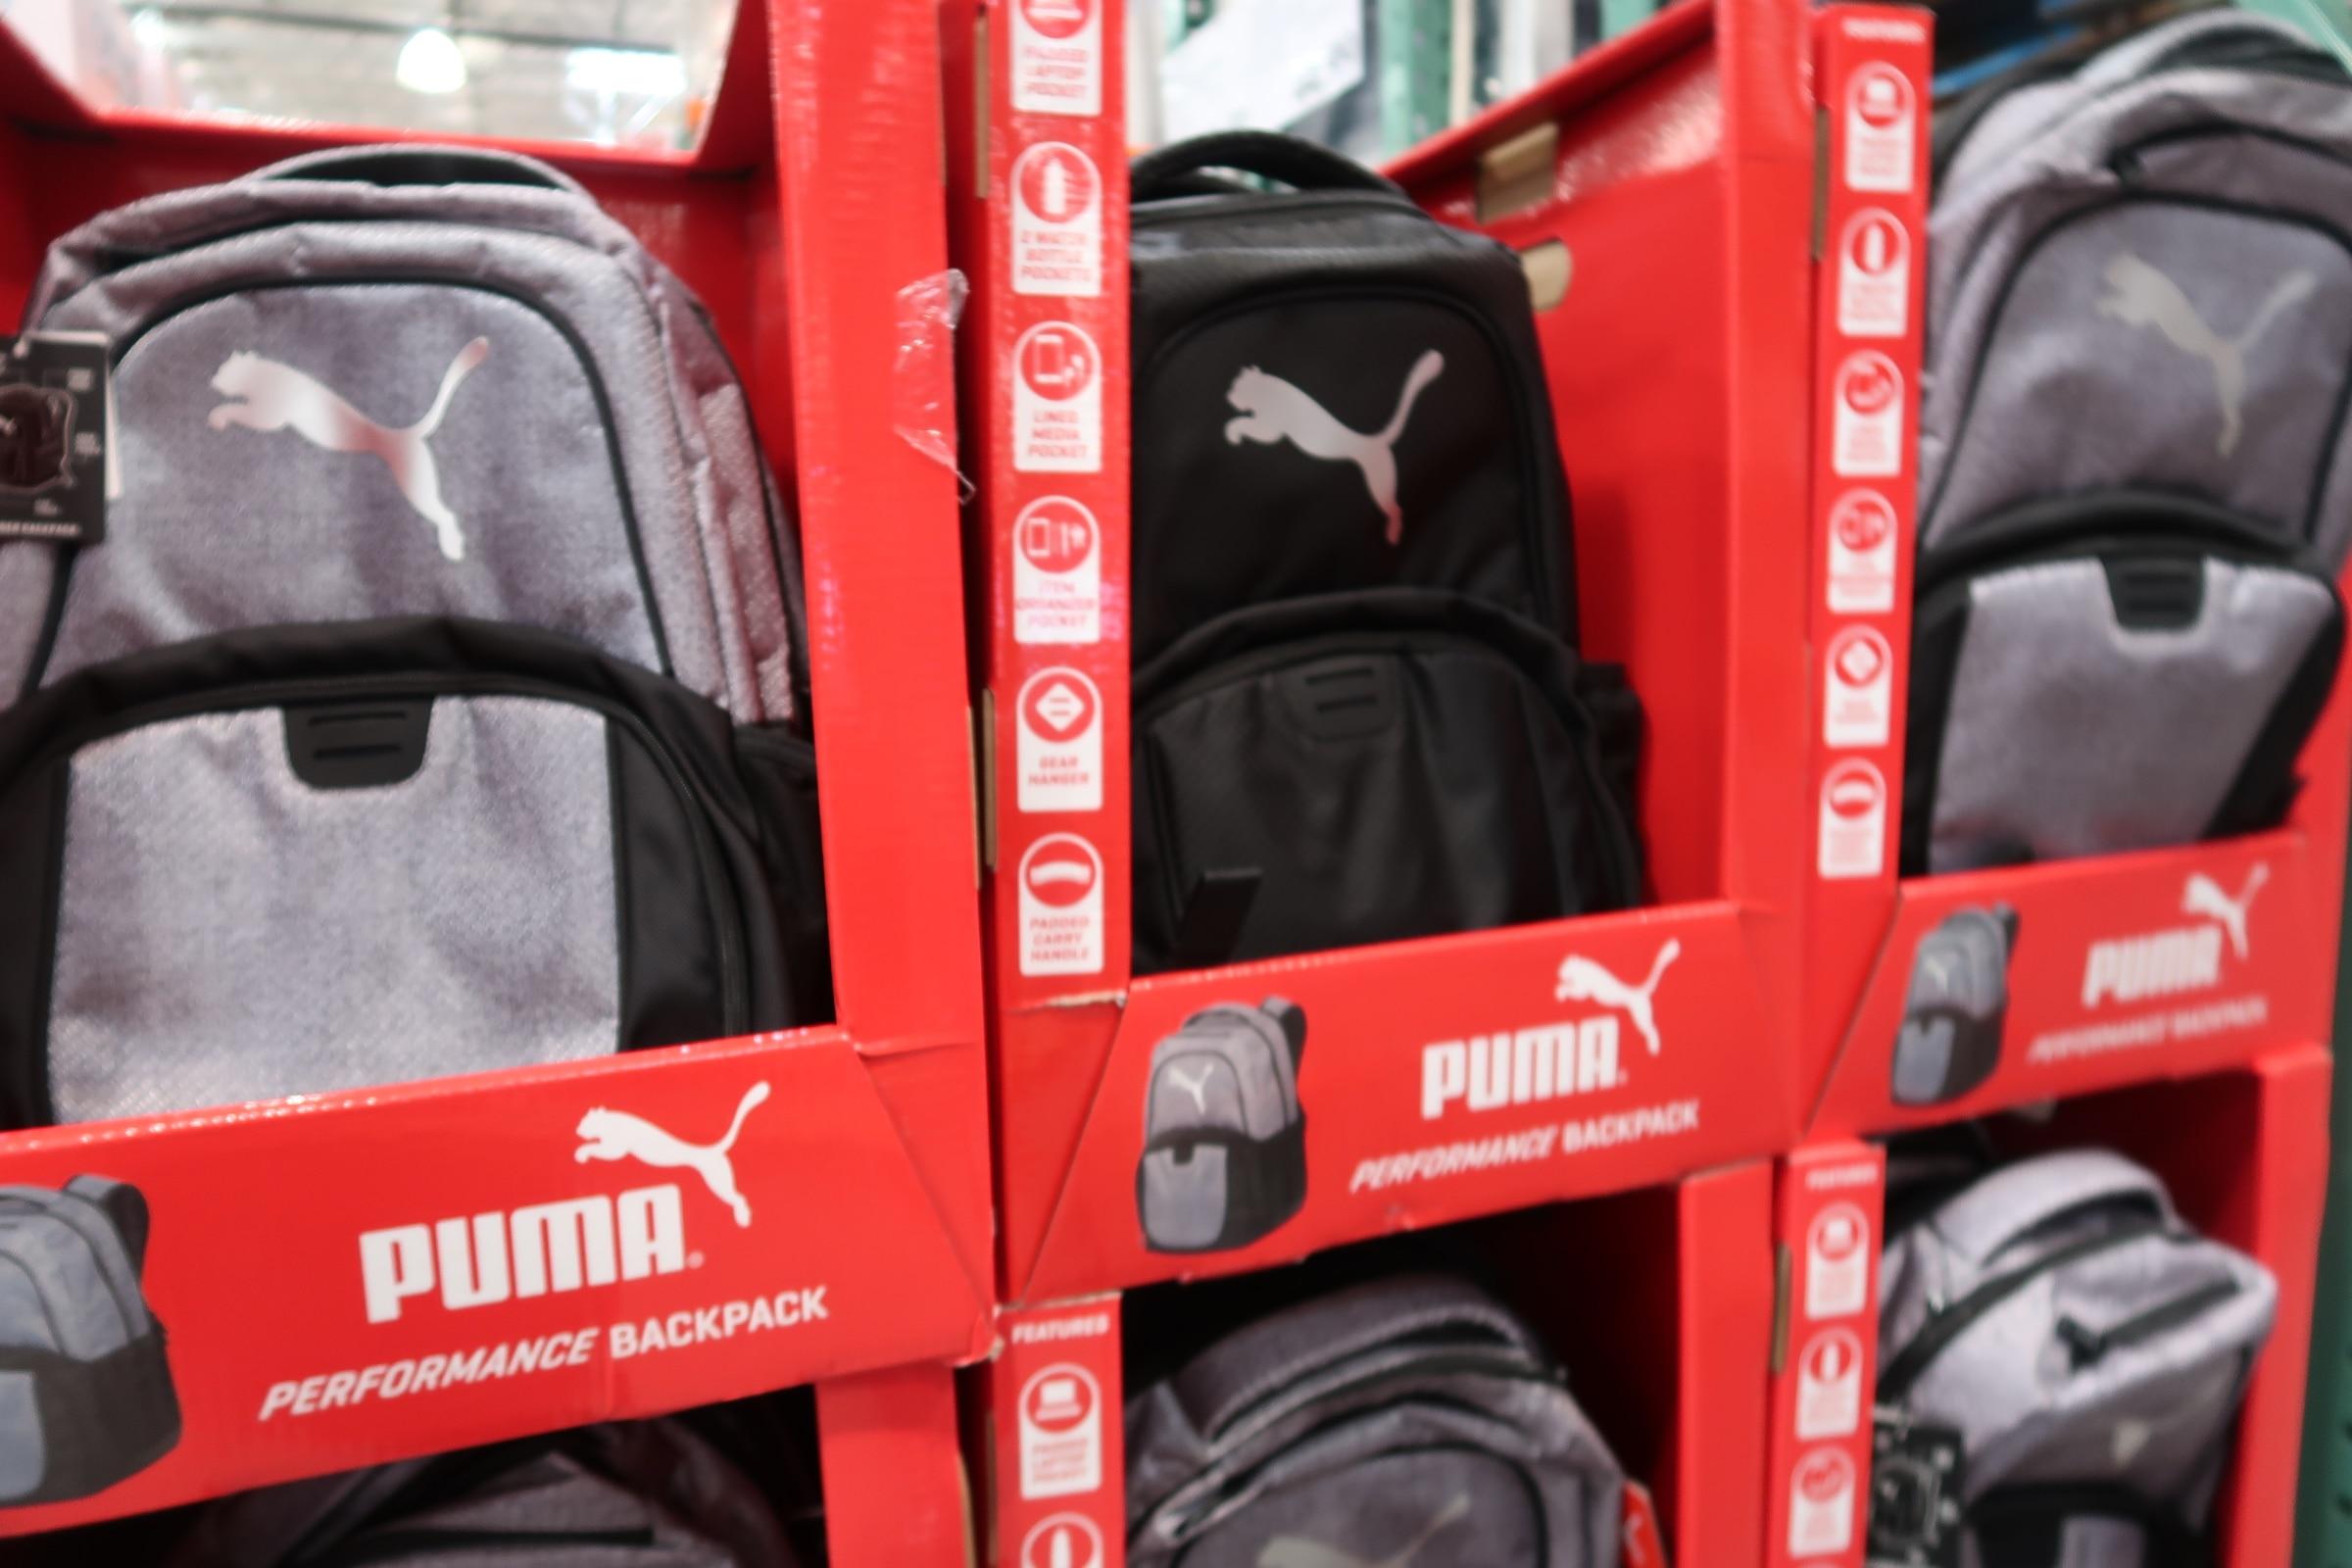 Puma Challenger Backpack $14.99